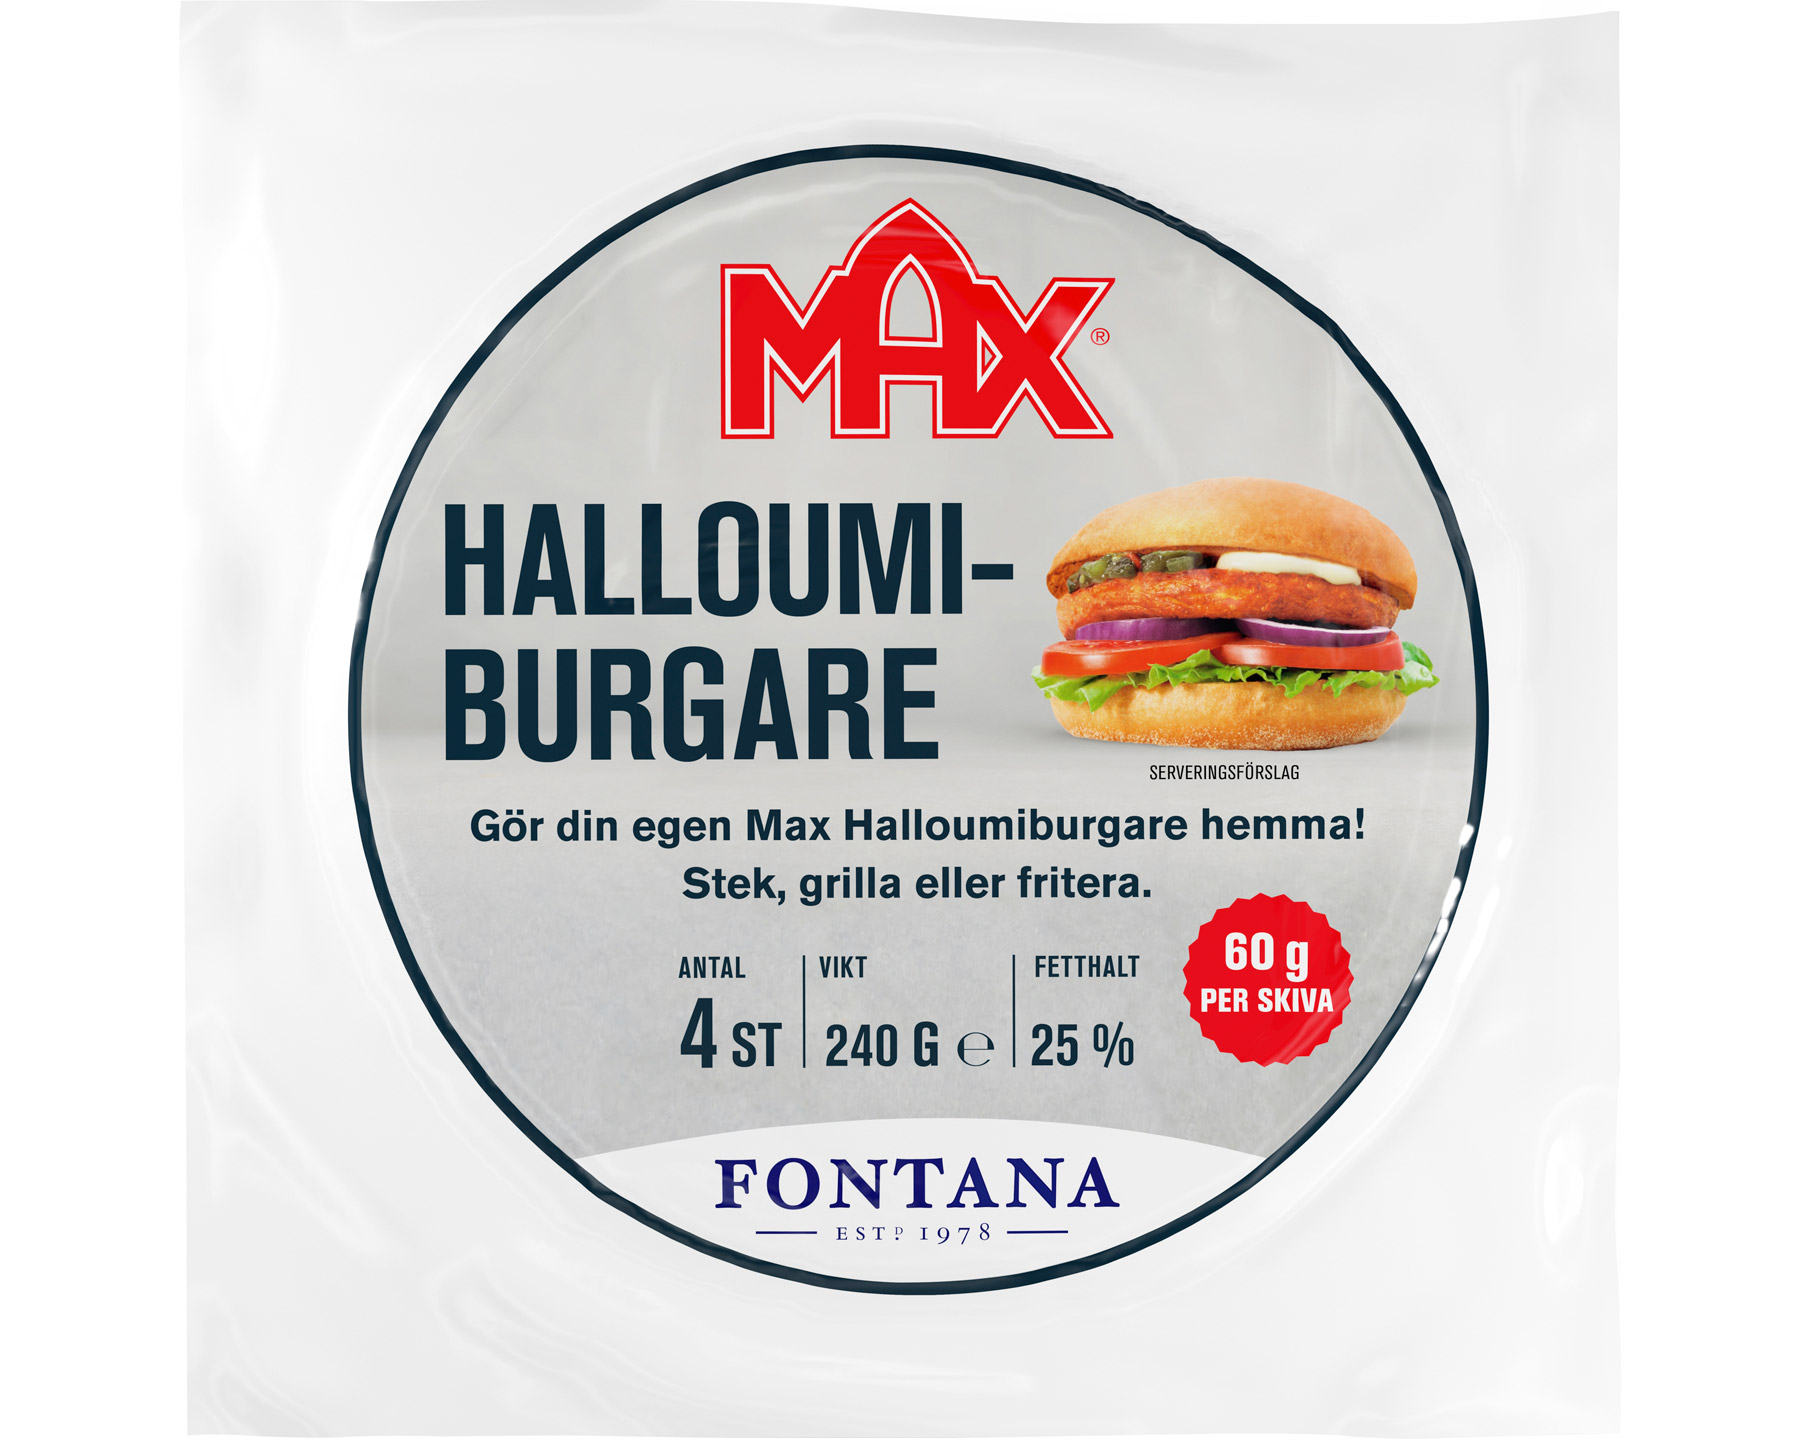 Fontana Halloumiburgare MAX 240 g